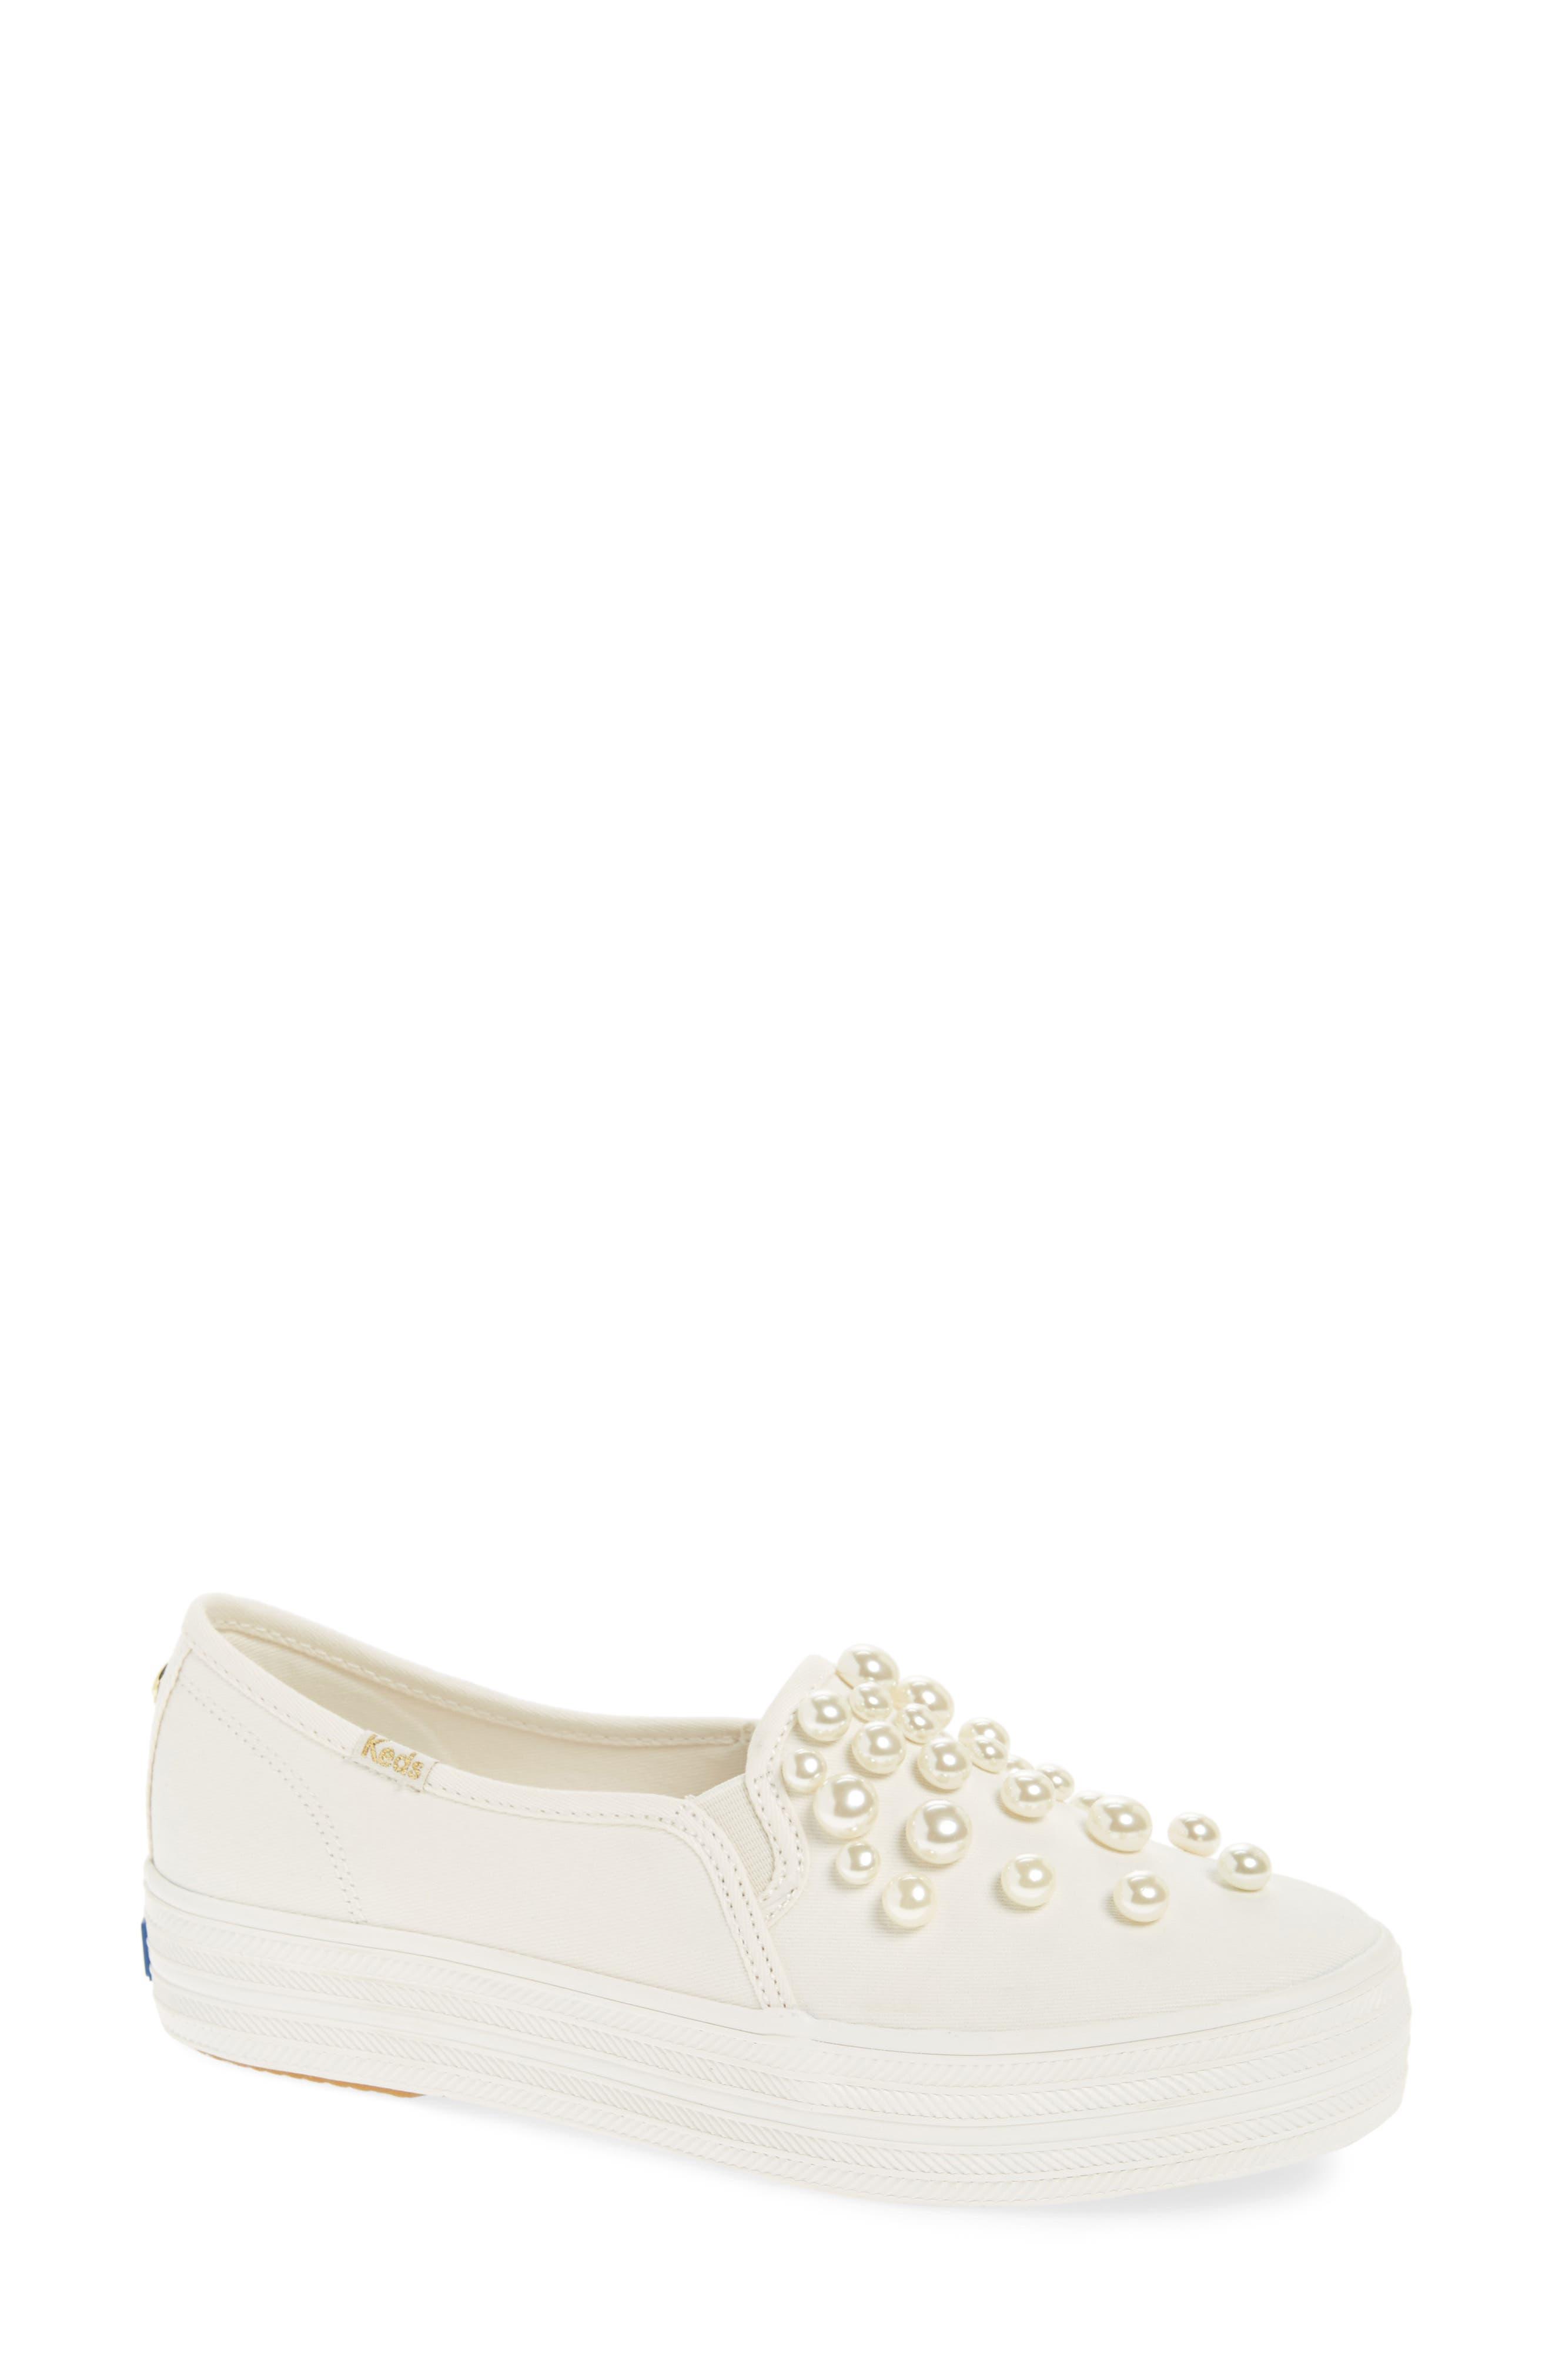 triple decker embellished slip-on sneaker,                         Main,                         color, CREAM